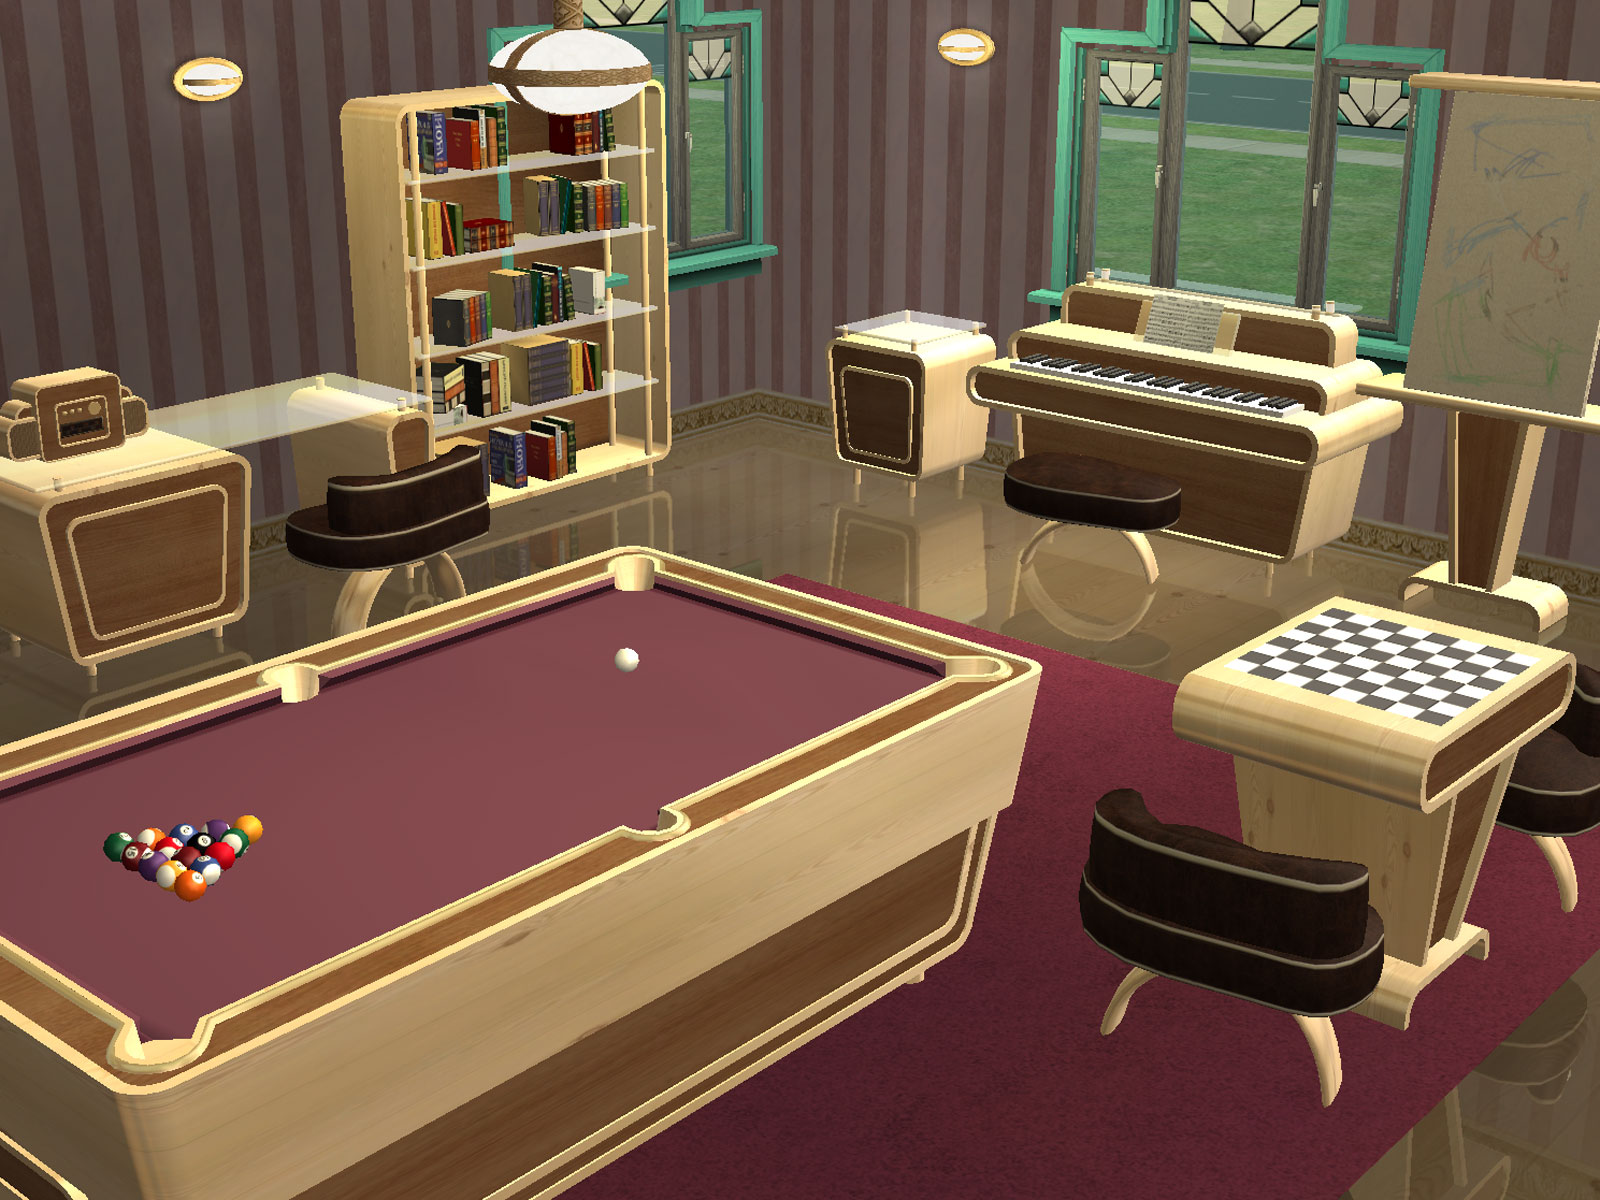 http://www.parsimonious.org/furniture2/files/k8-Noguchi_Hobbies.jpg